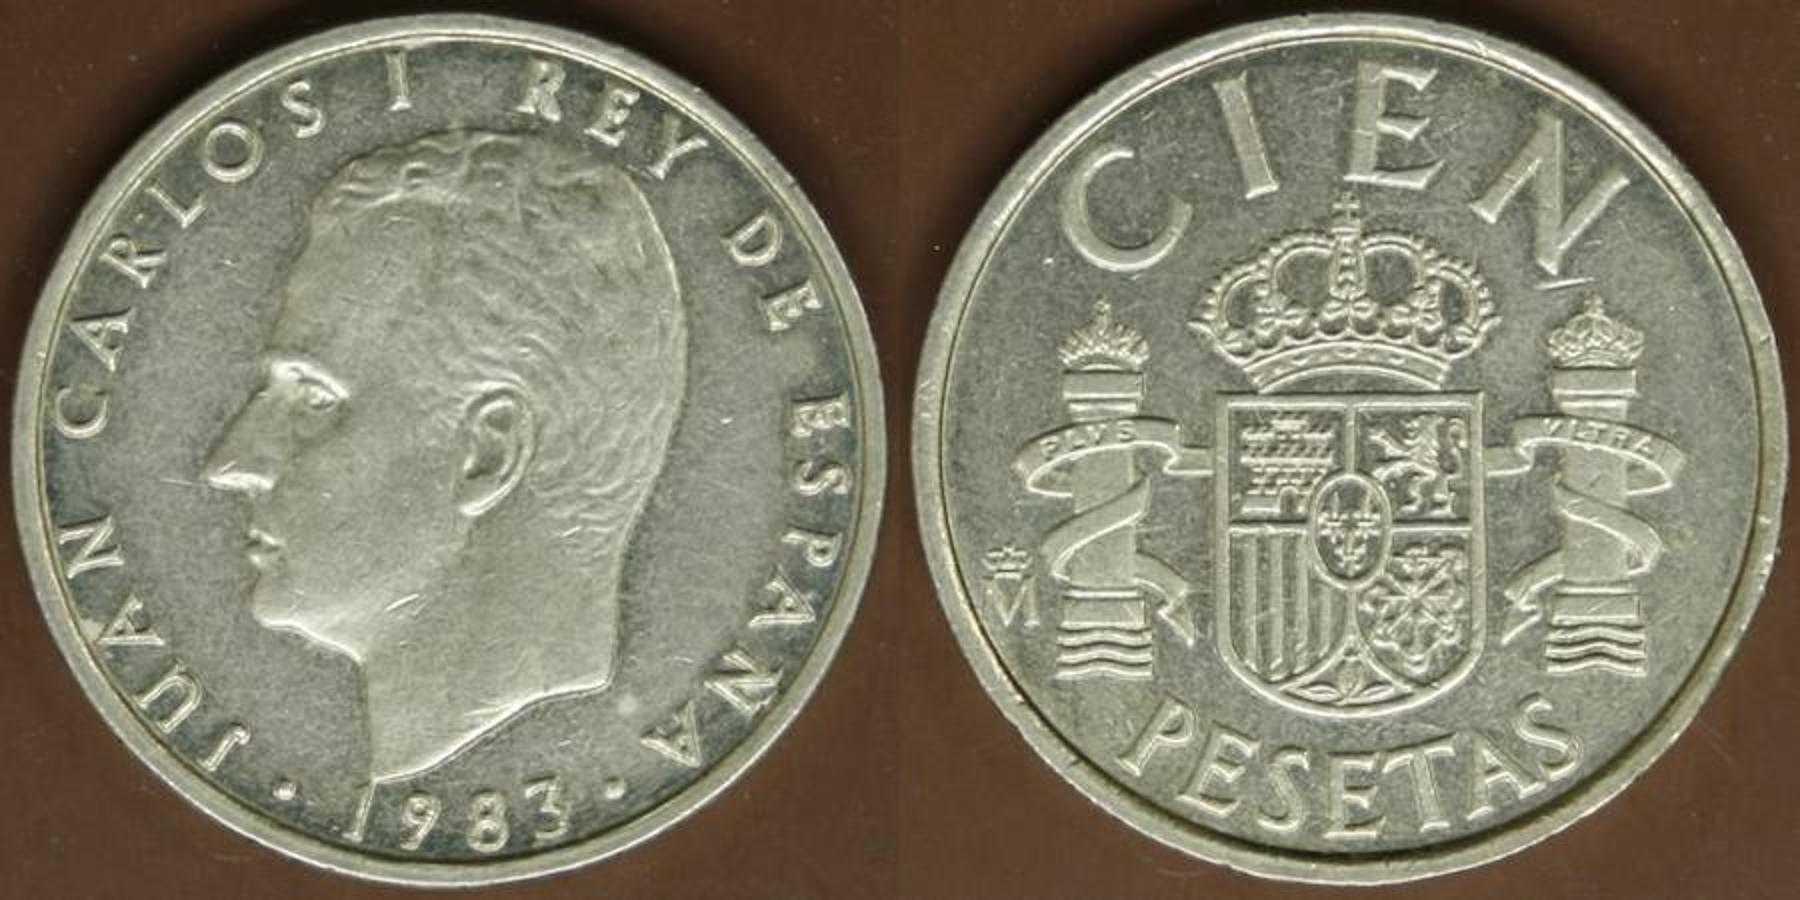 100 Pesetas 1983. Los míticos «20 duros» están representados por esta dorada moneda de 1983, valorada en 55 euros.